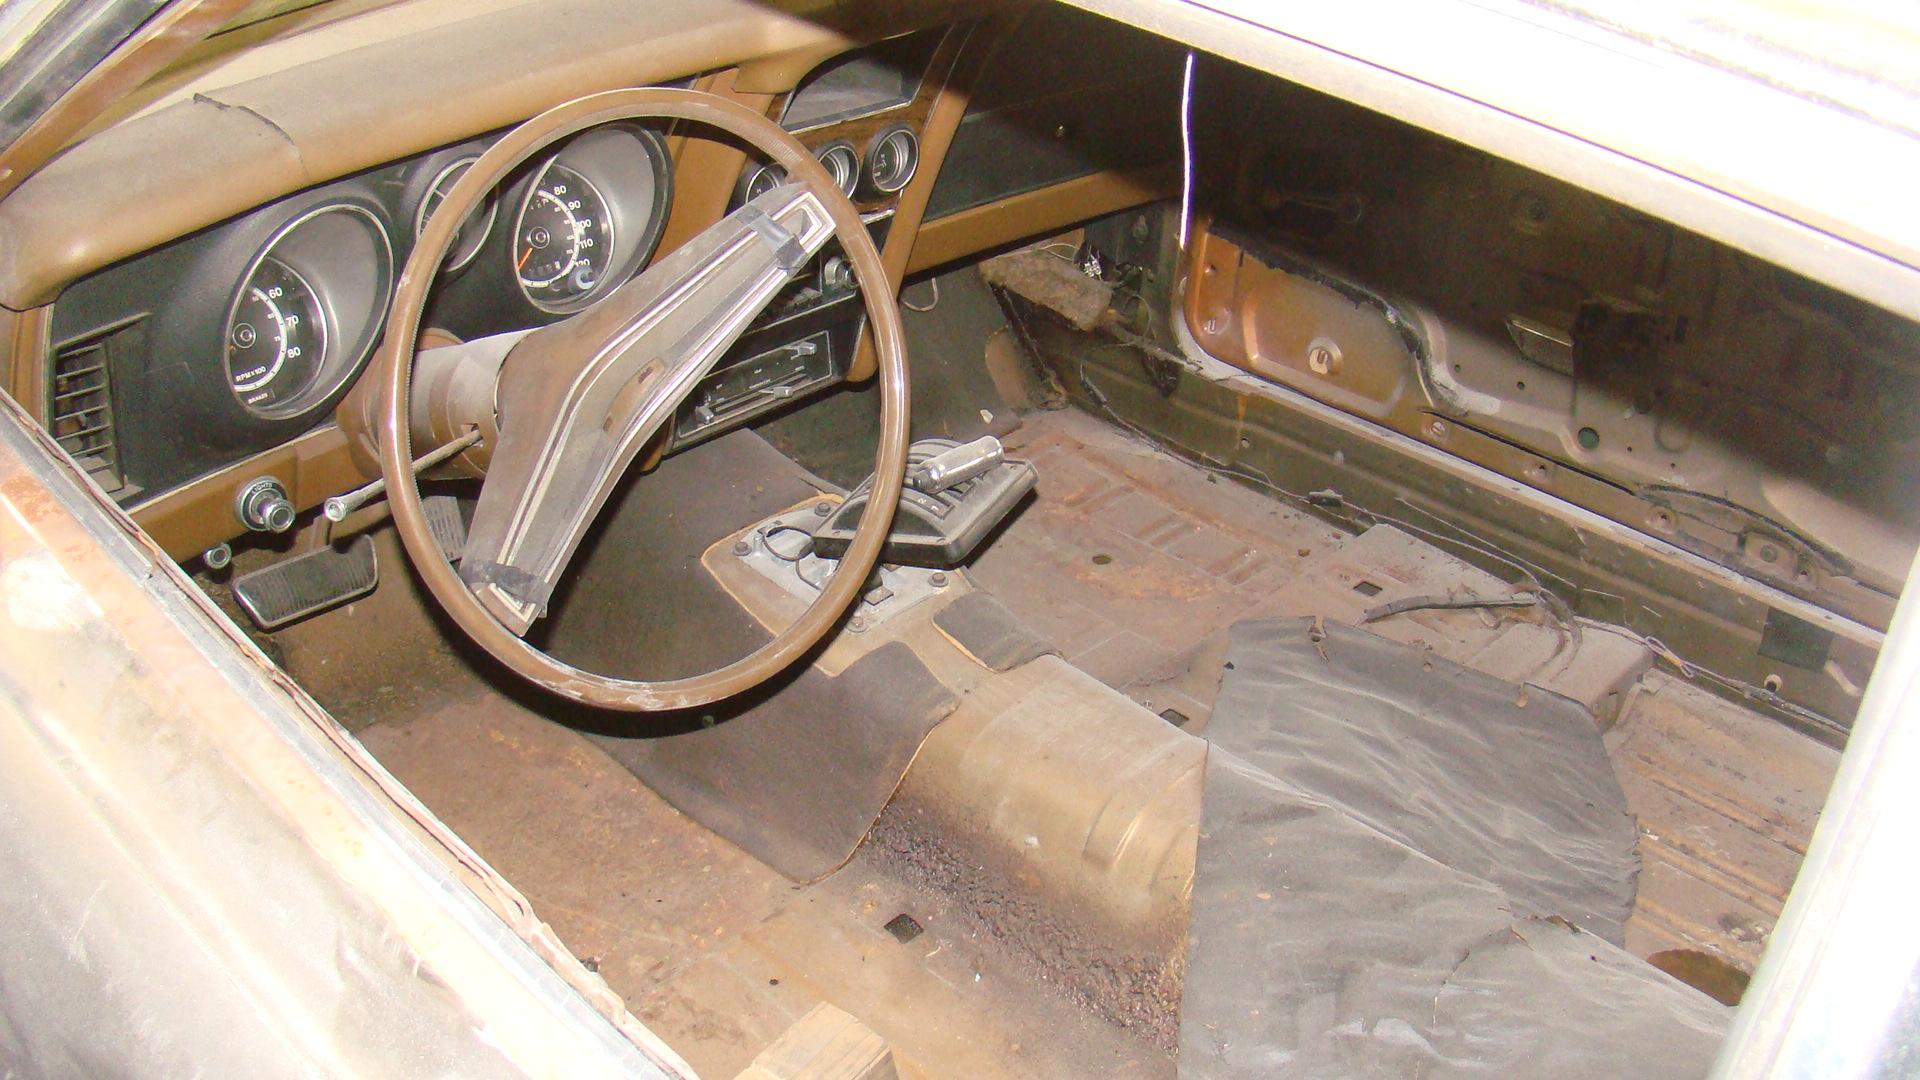 1973 Ford Mustang Mach 1 interior stripped restoration